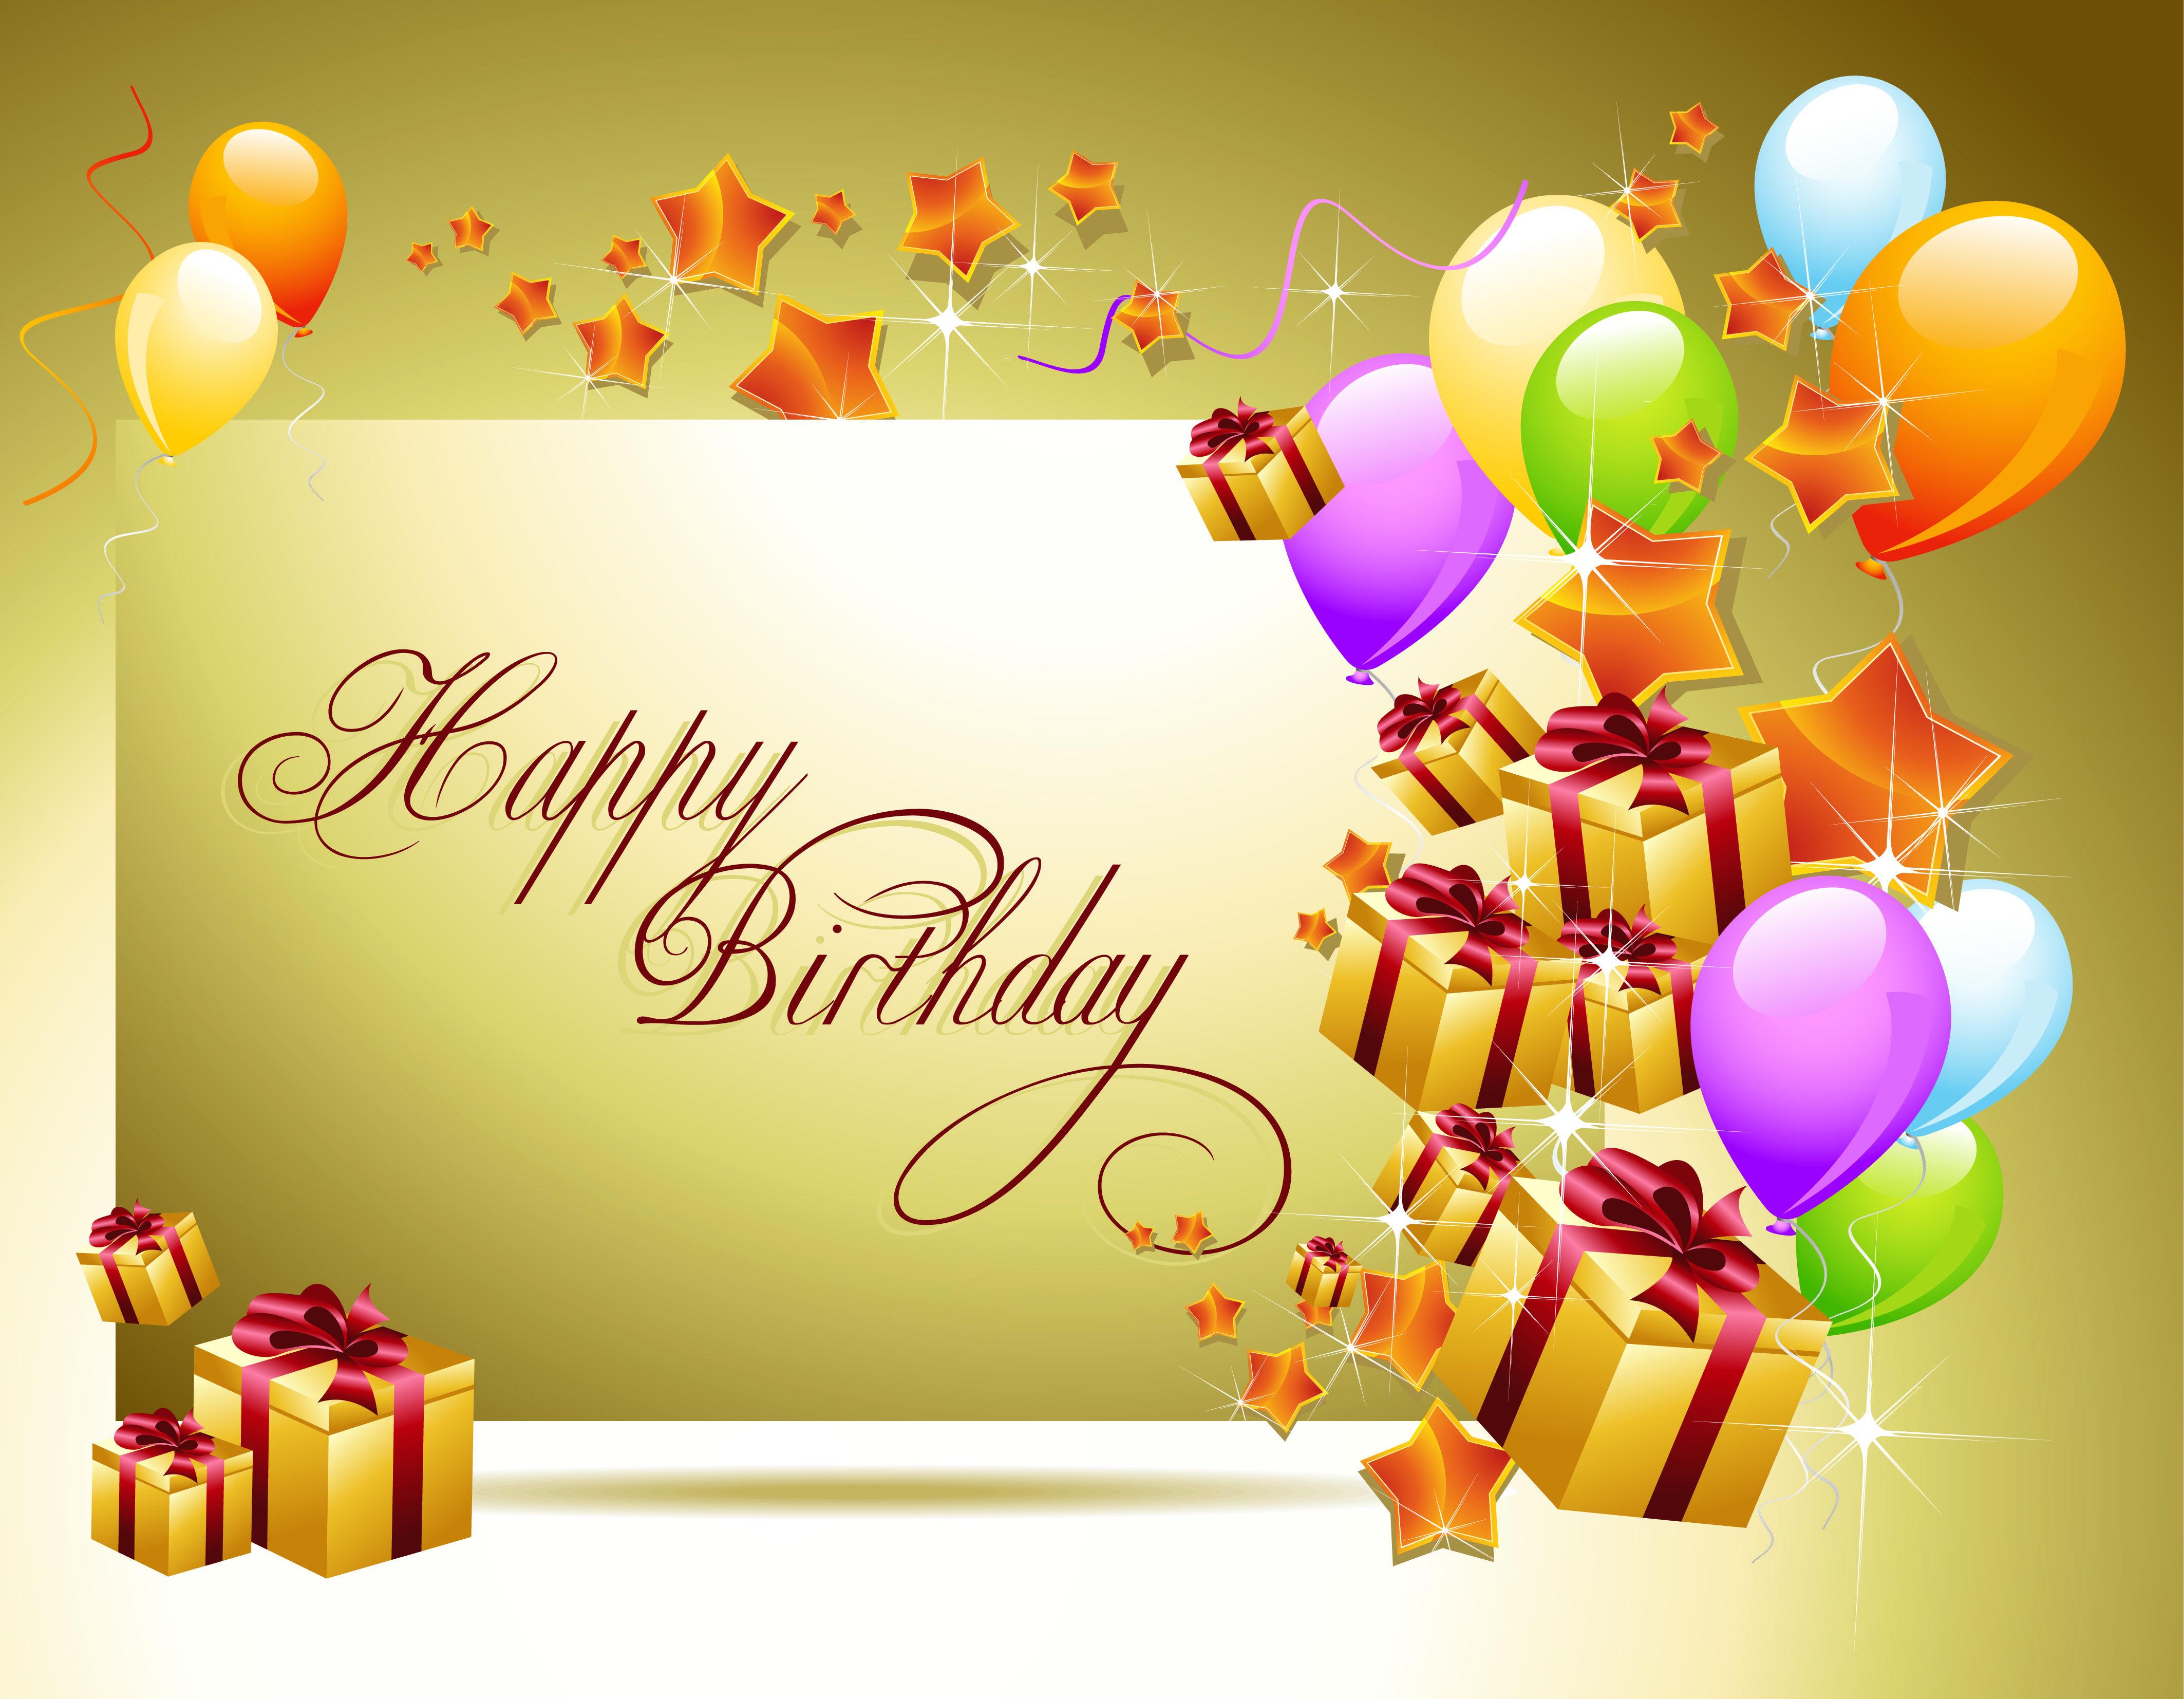 Happy Birthday Greetings Happy Birthday Image – Greetings About Birthday